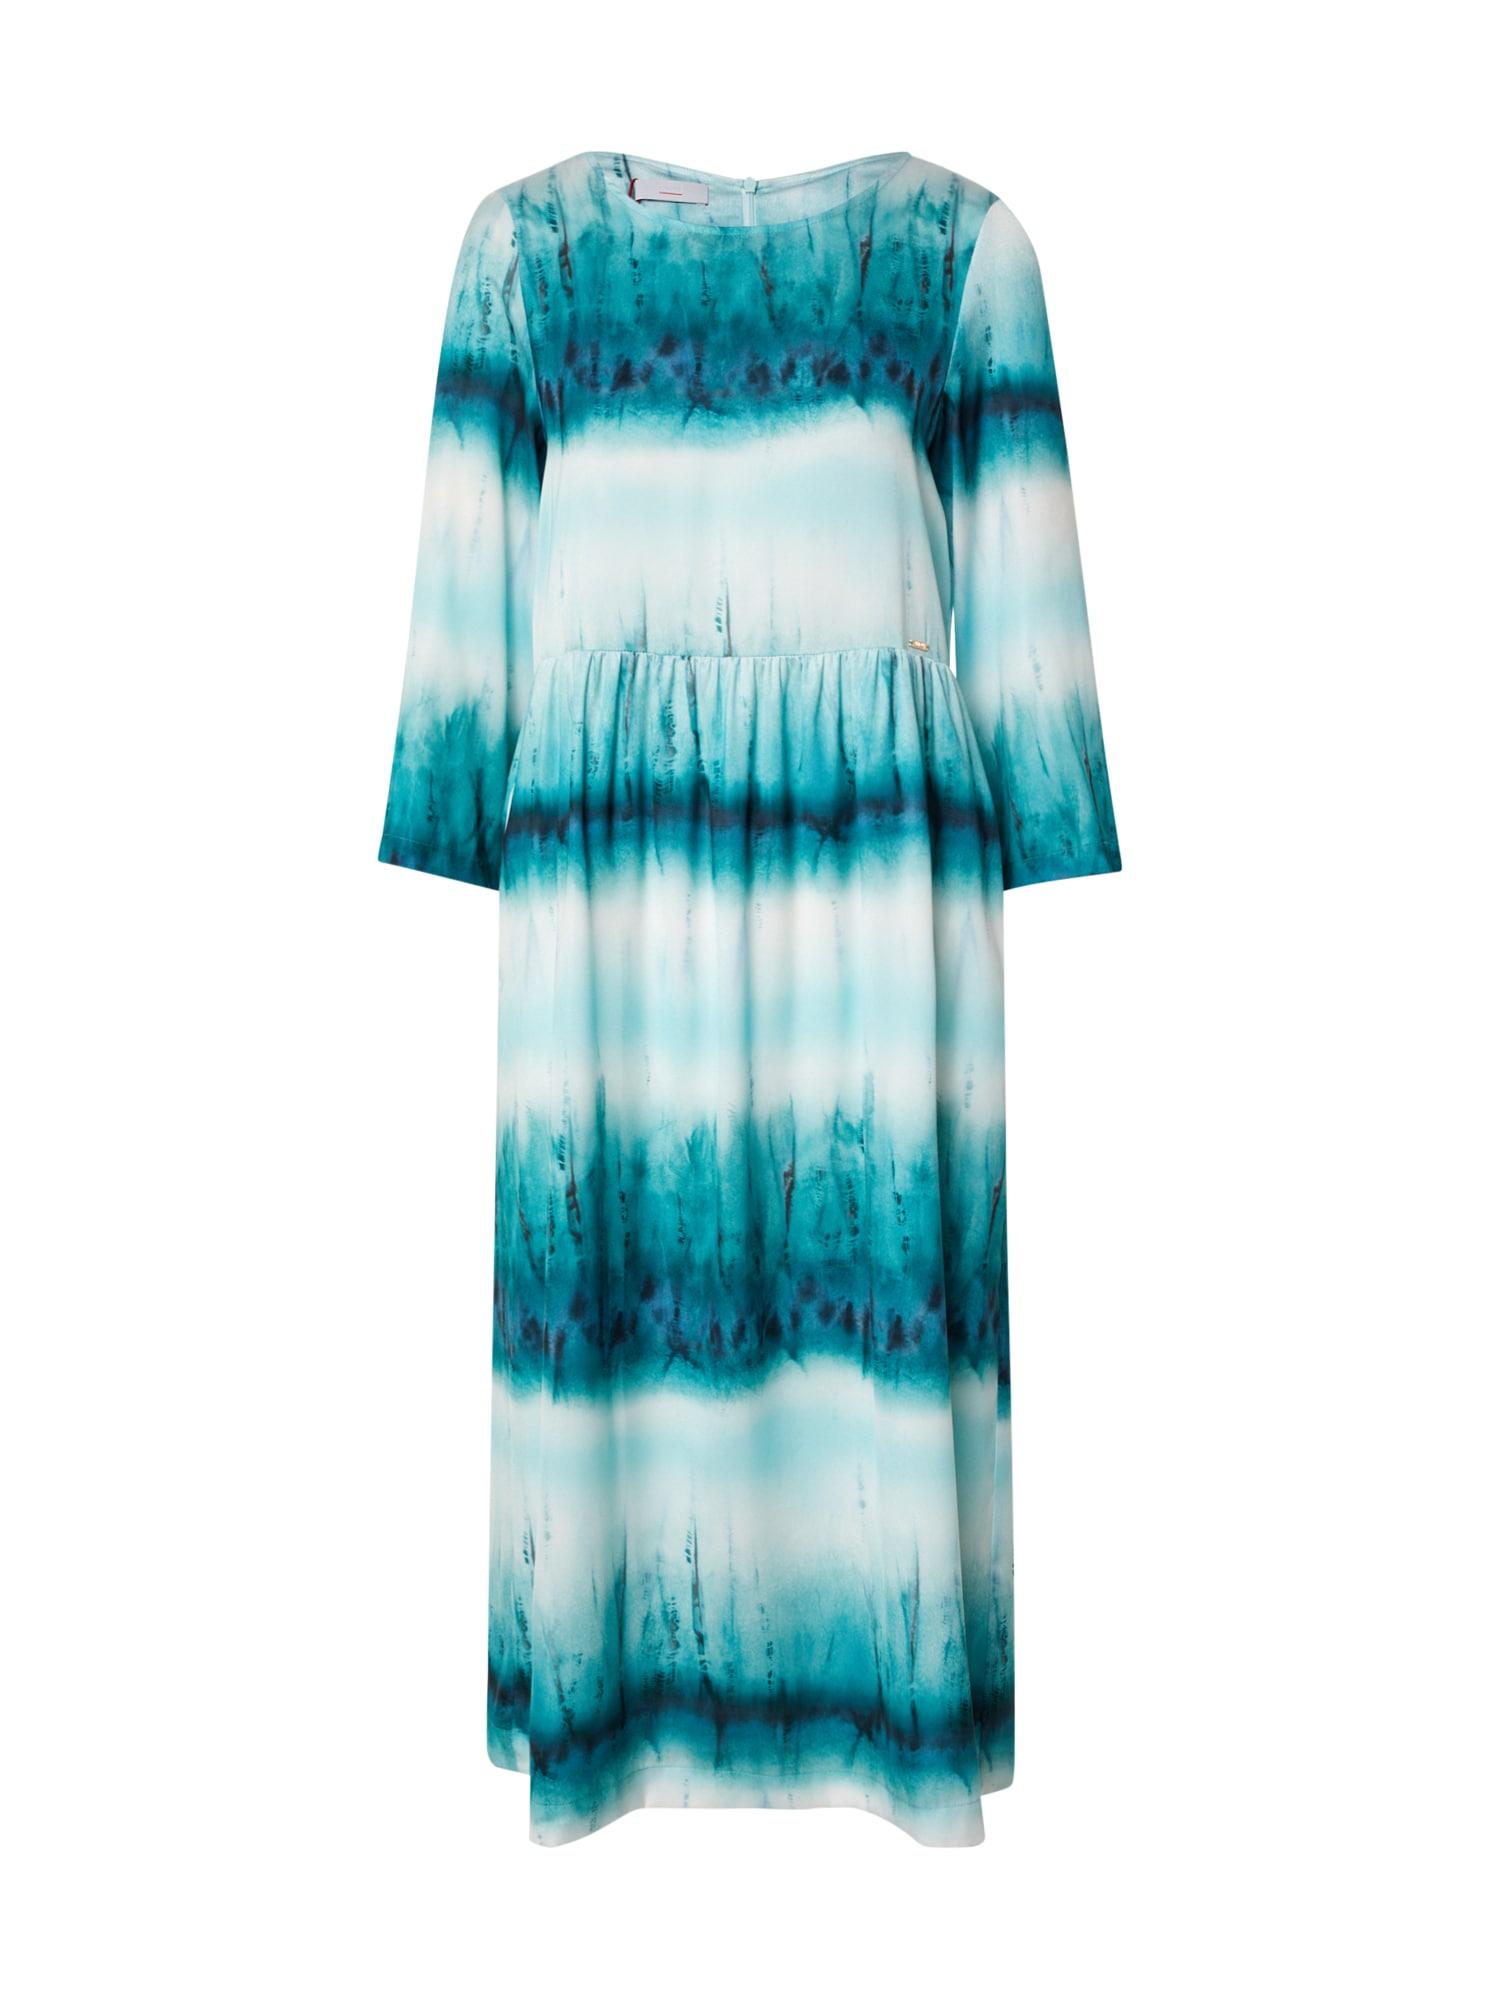 CINQUE Suknelė 'CIDALINA' mėlyna / turkio spalva